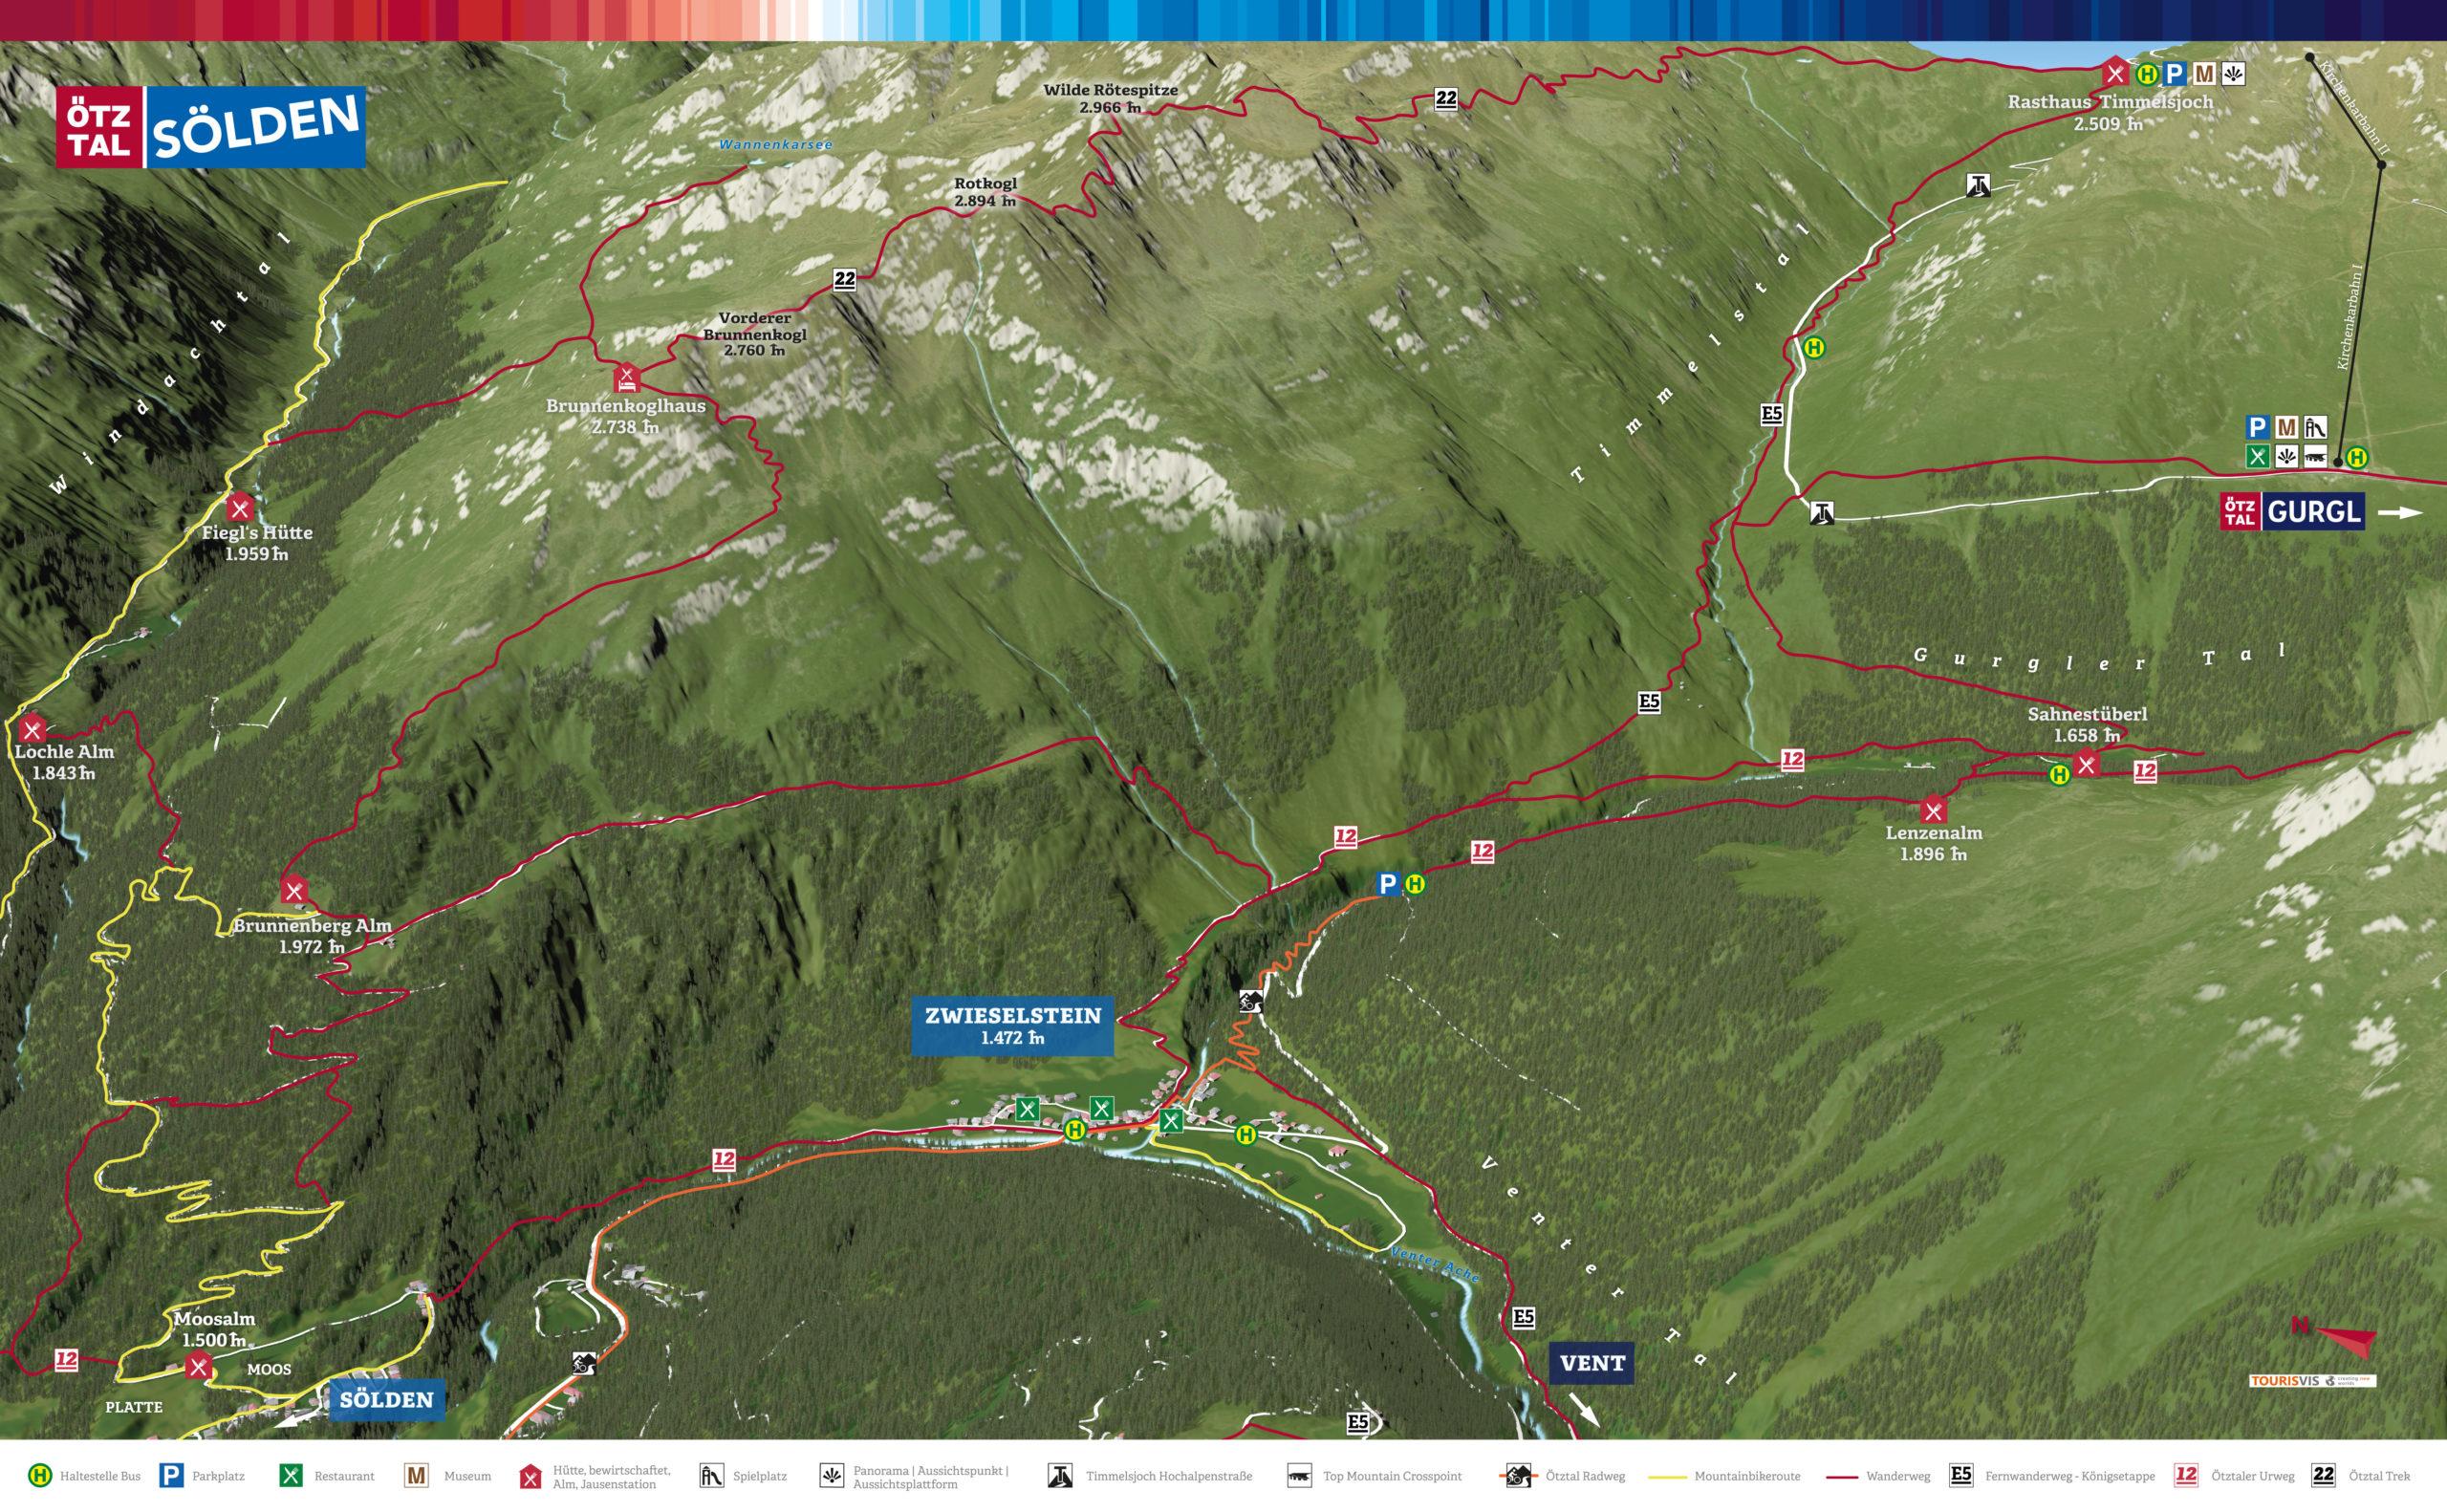 3D Panoramakarte Zwieselstein - Stille Seite - Wandern/MTB Ötztal